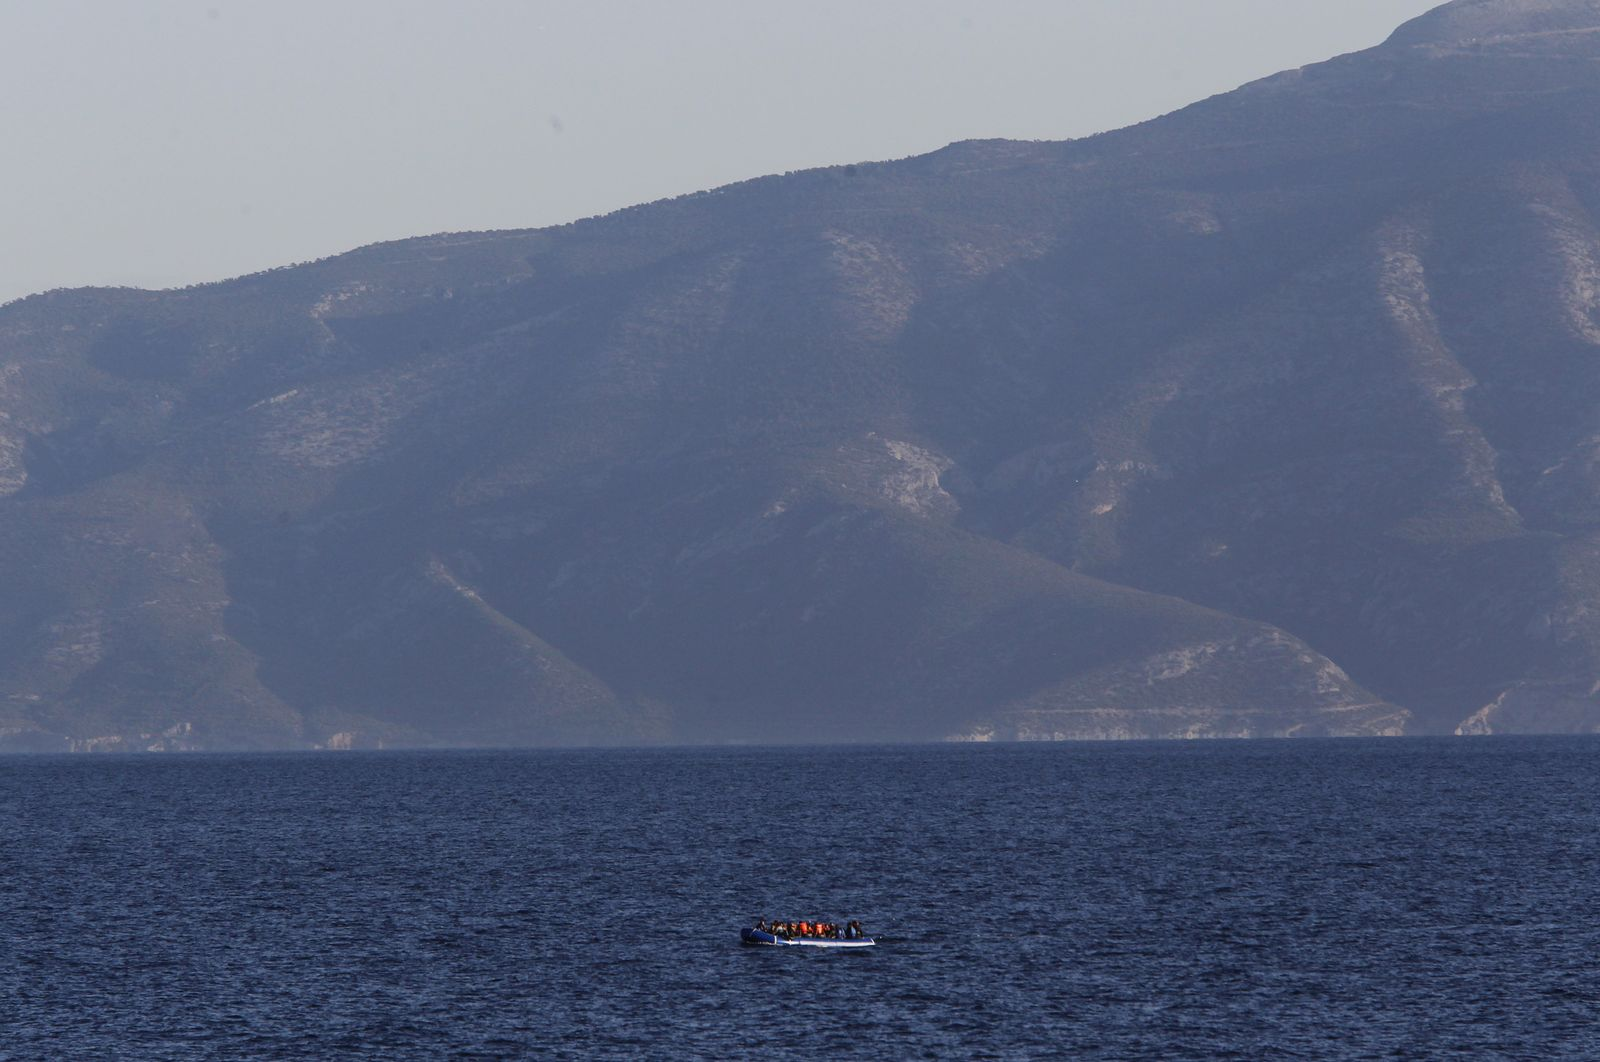 Griechenland/ Agathonisi/ Flüchtlinge